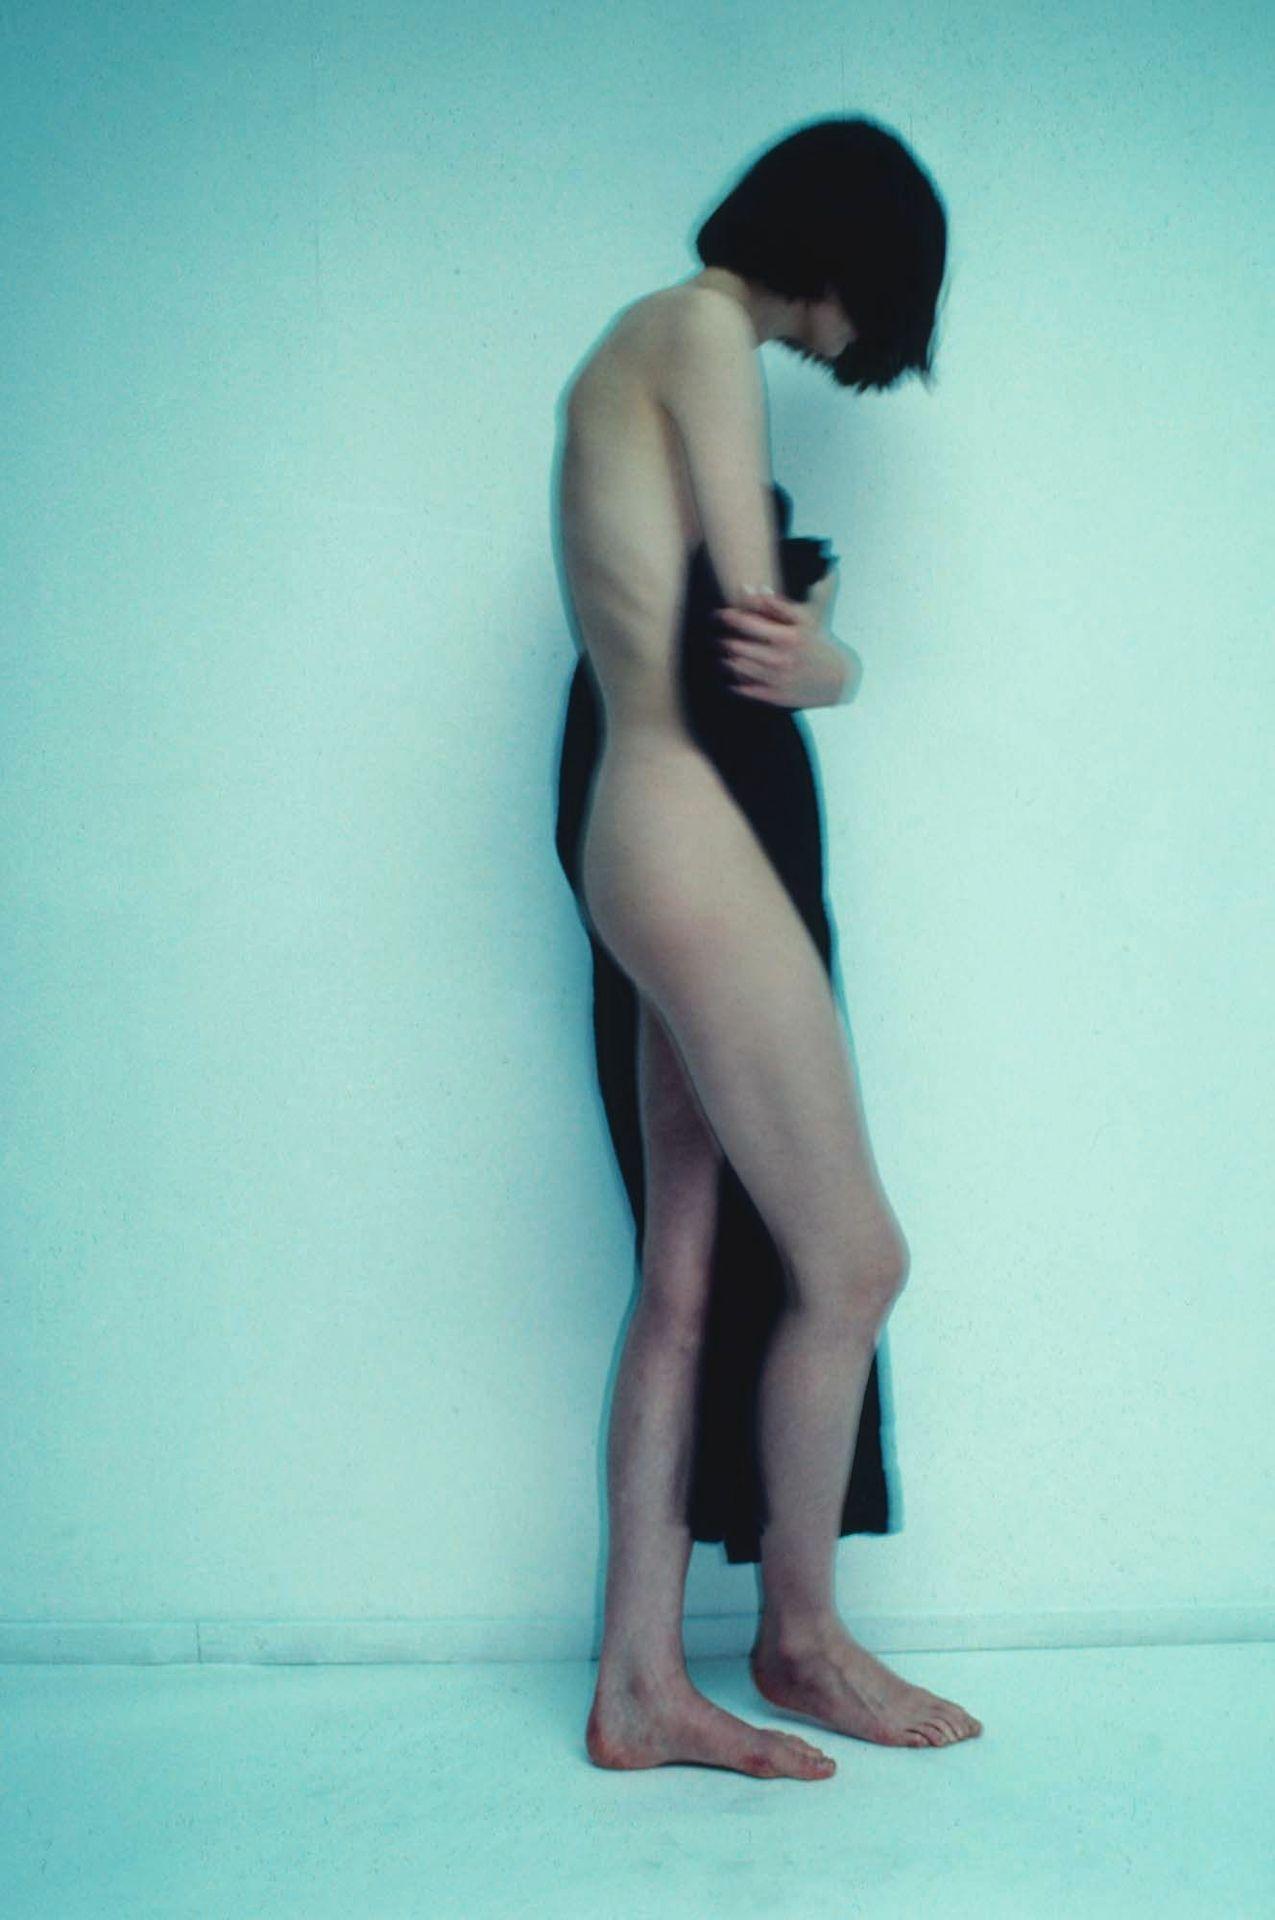 Erin_OConnor-1996-Mark_Borthwick-jinxproof.jpg